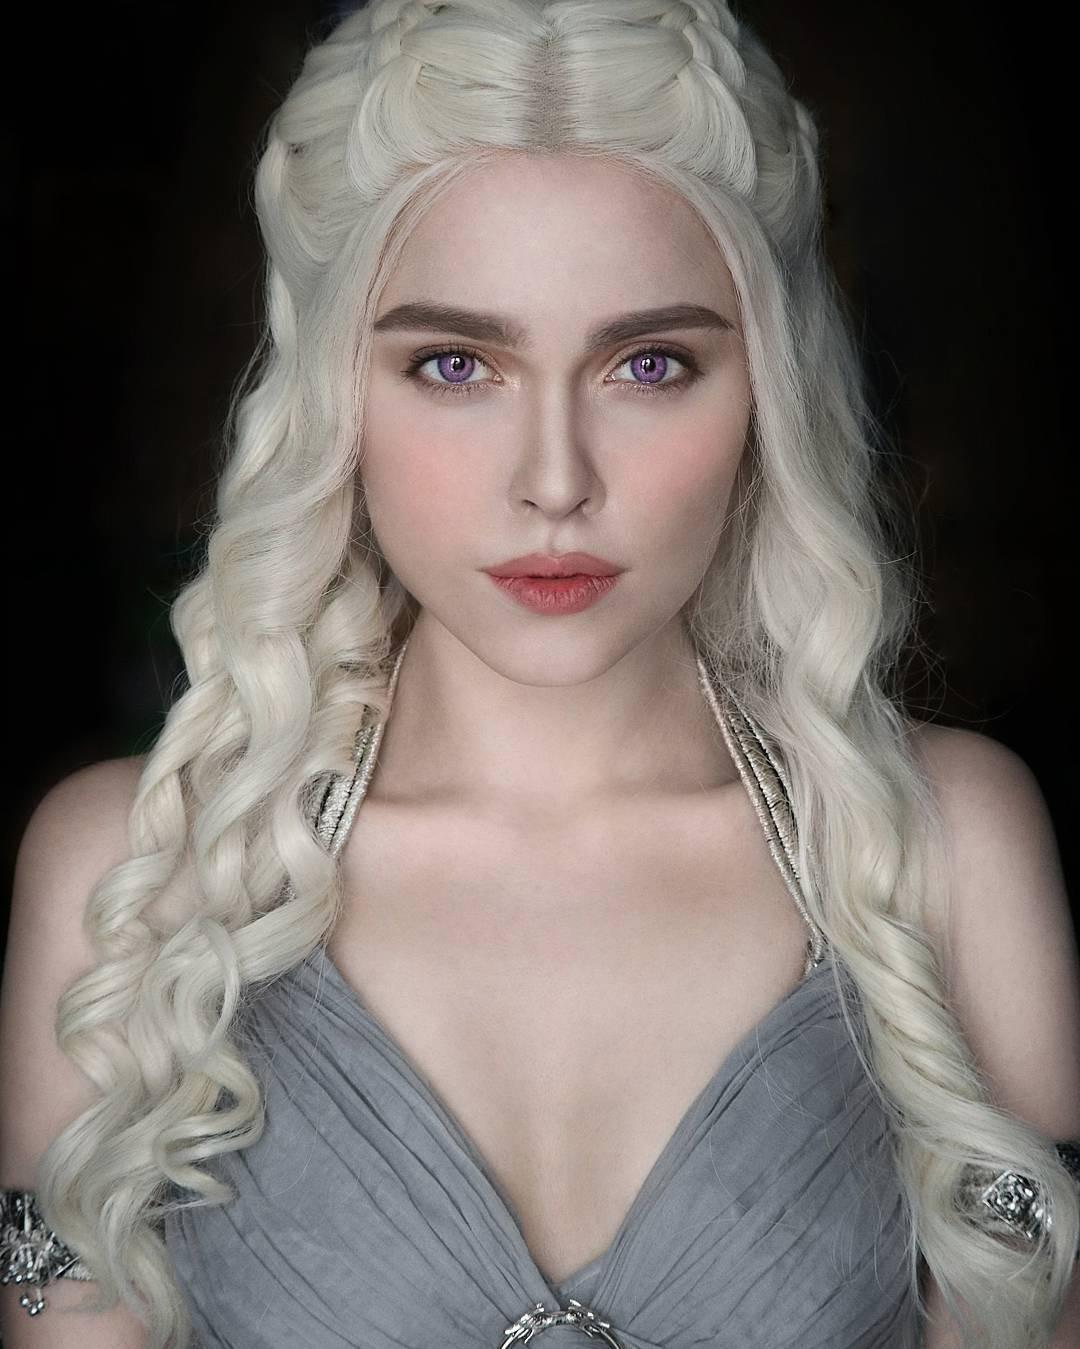 "Résultat de recherche d'images pour ""daenerys targaryen cosplay"""